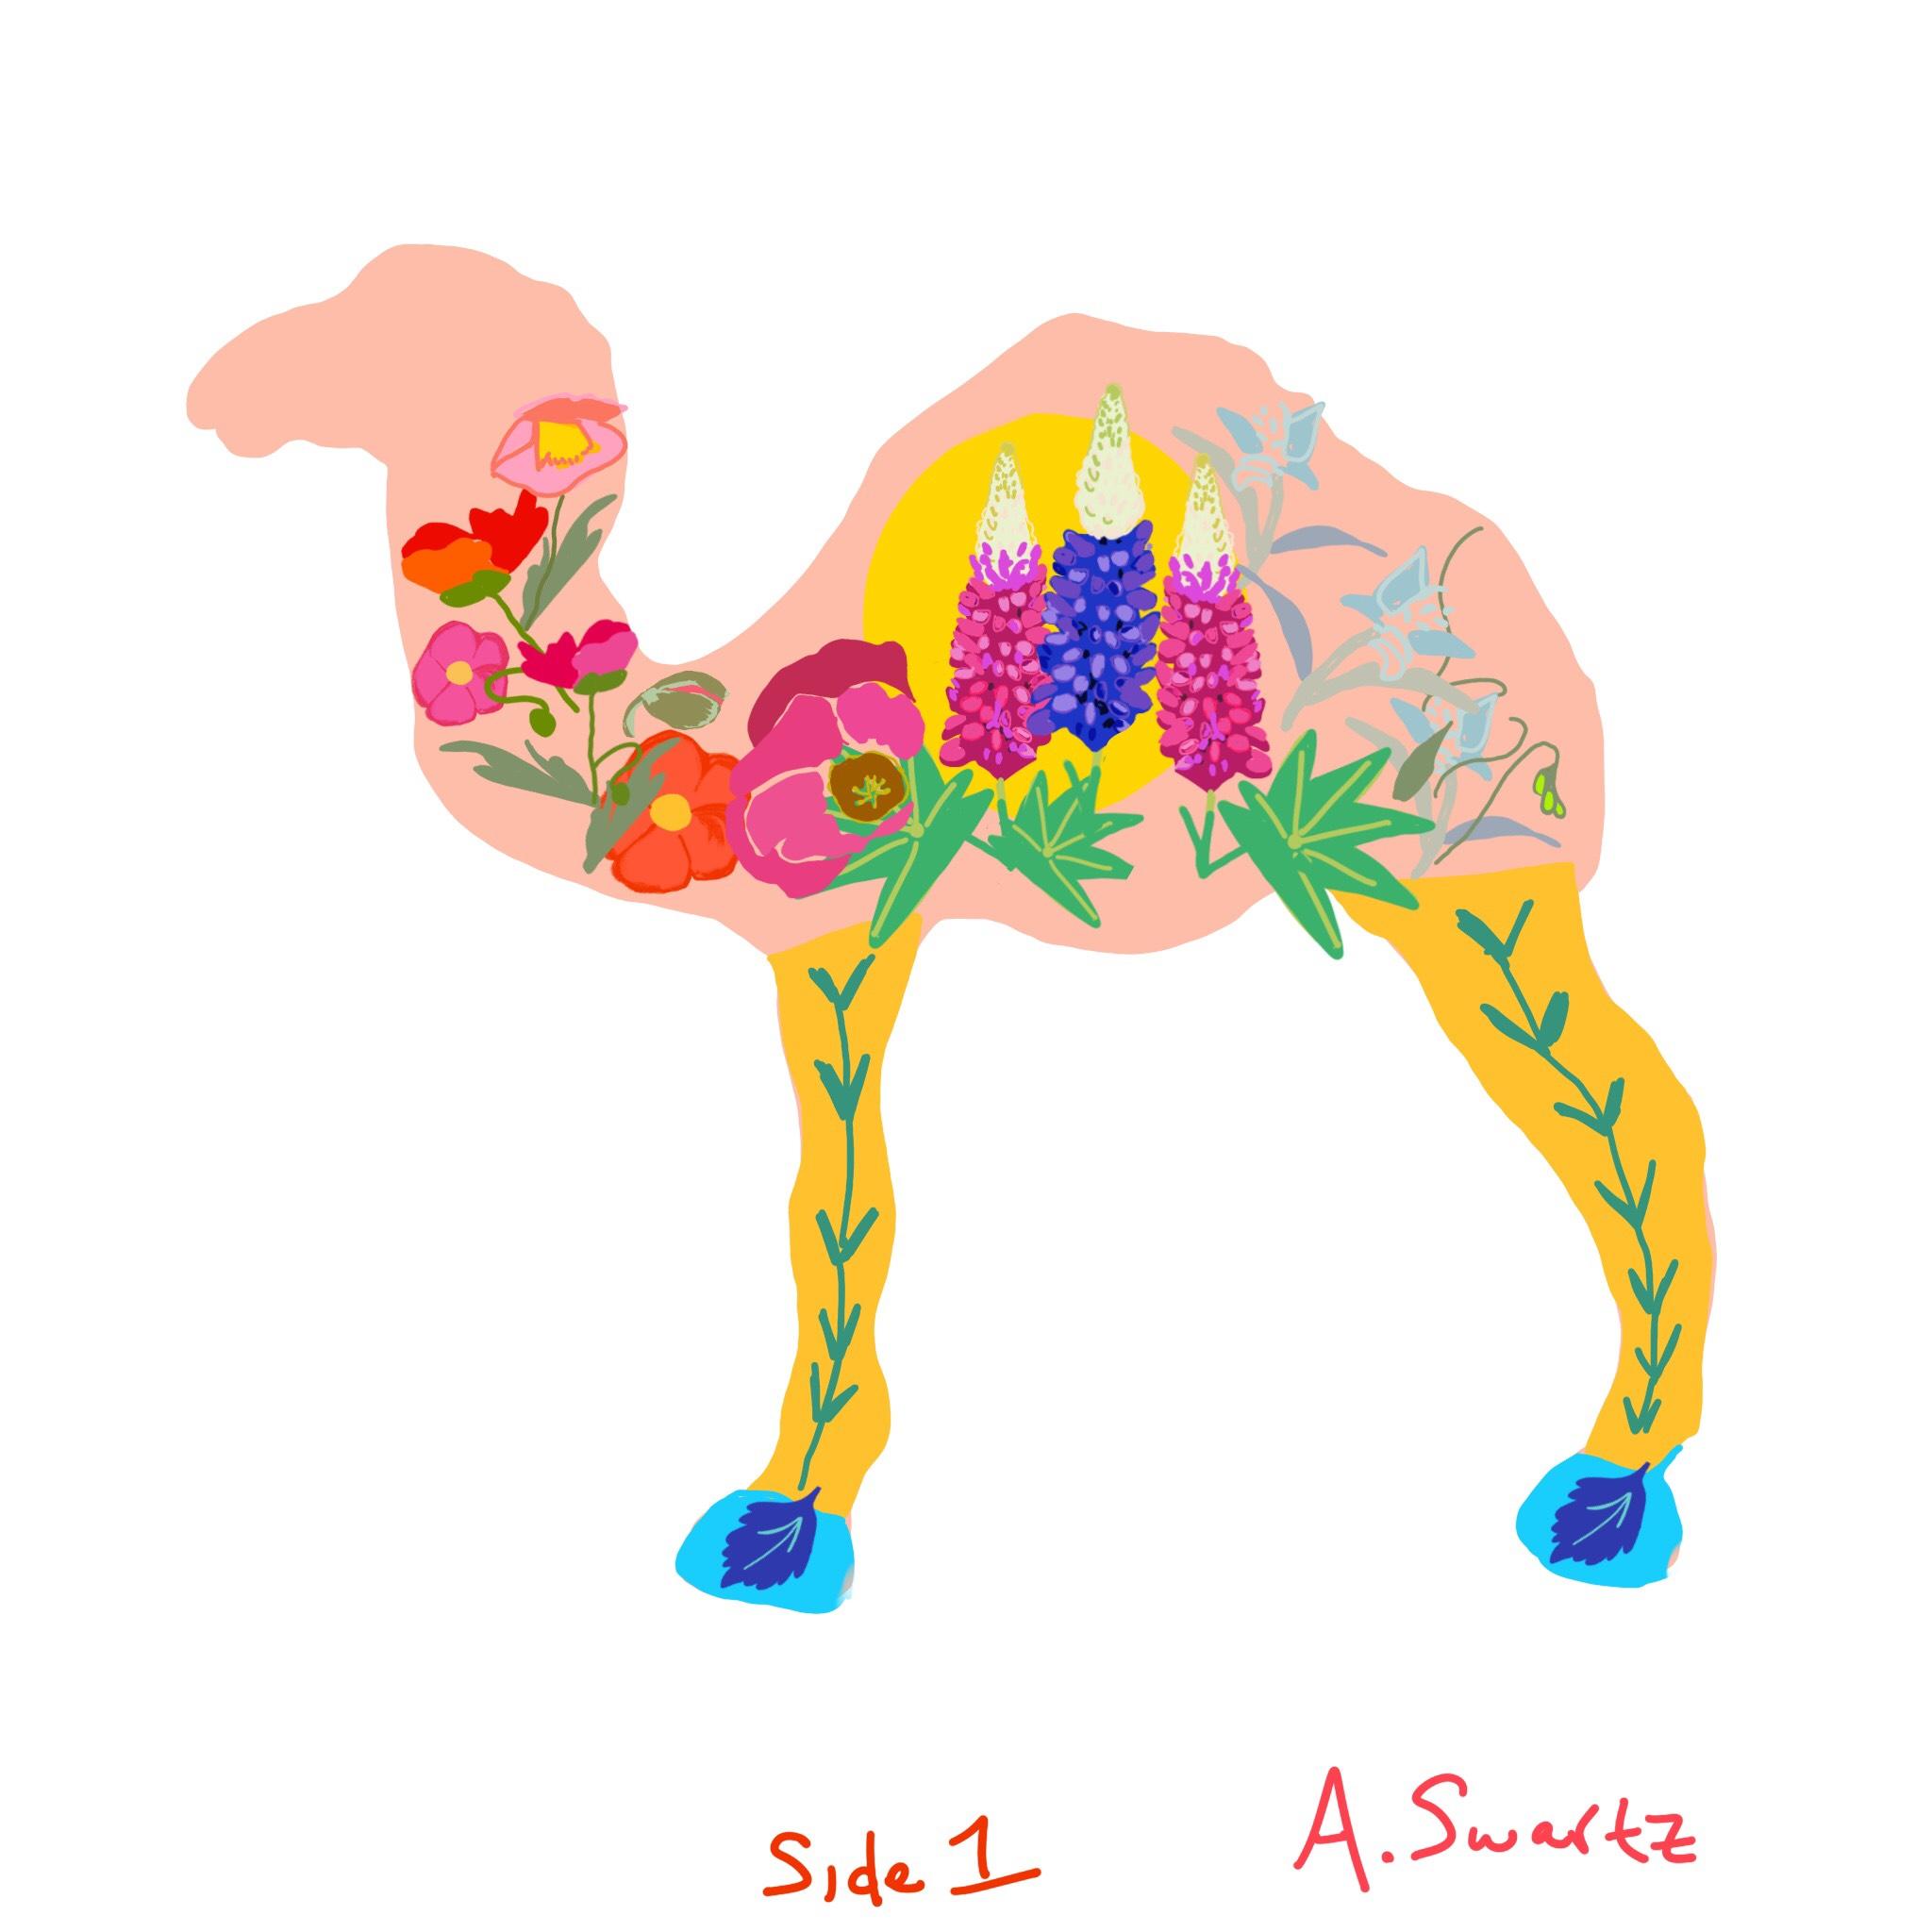 A.Swartz.Camel.Sketch.1.jpg